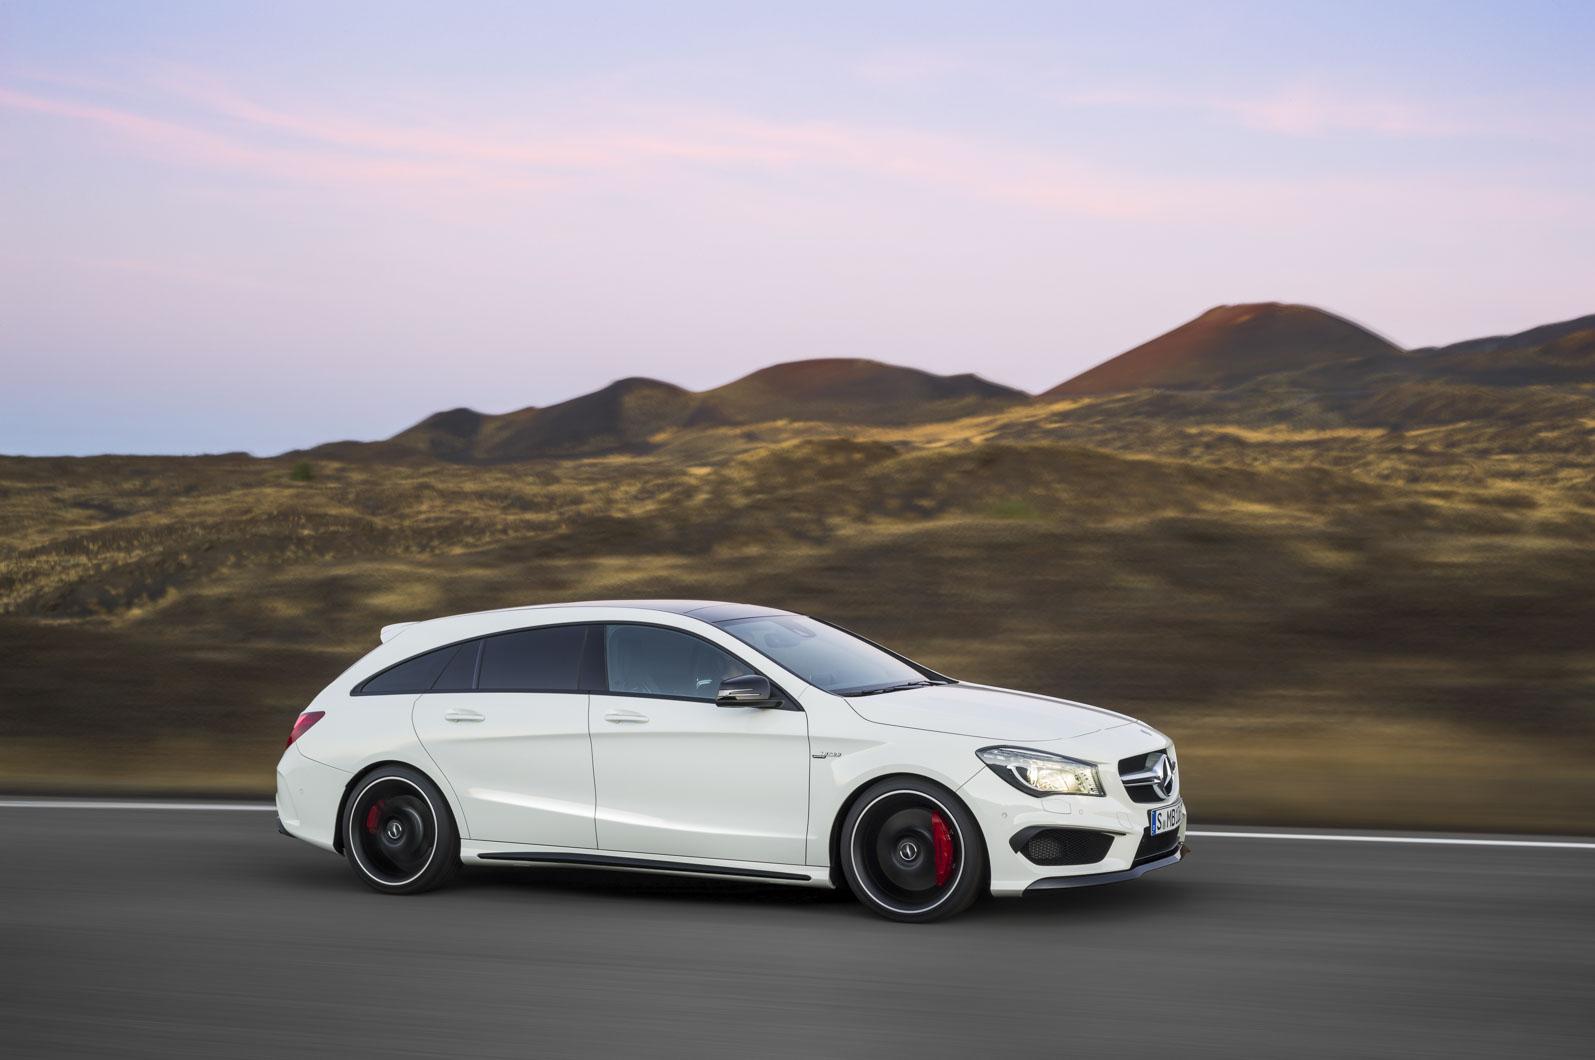 The New Mercedes Benz CLA 45 AMG Shooting Breake Avant Garde Meets